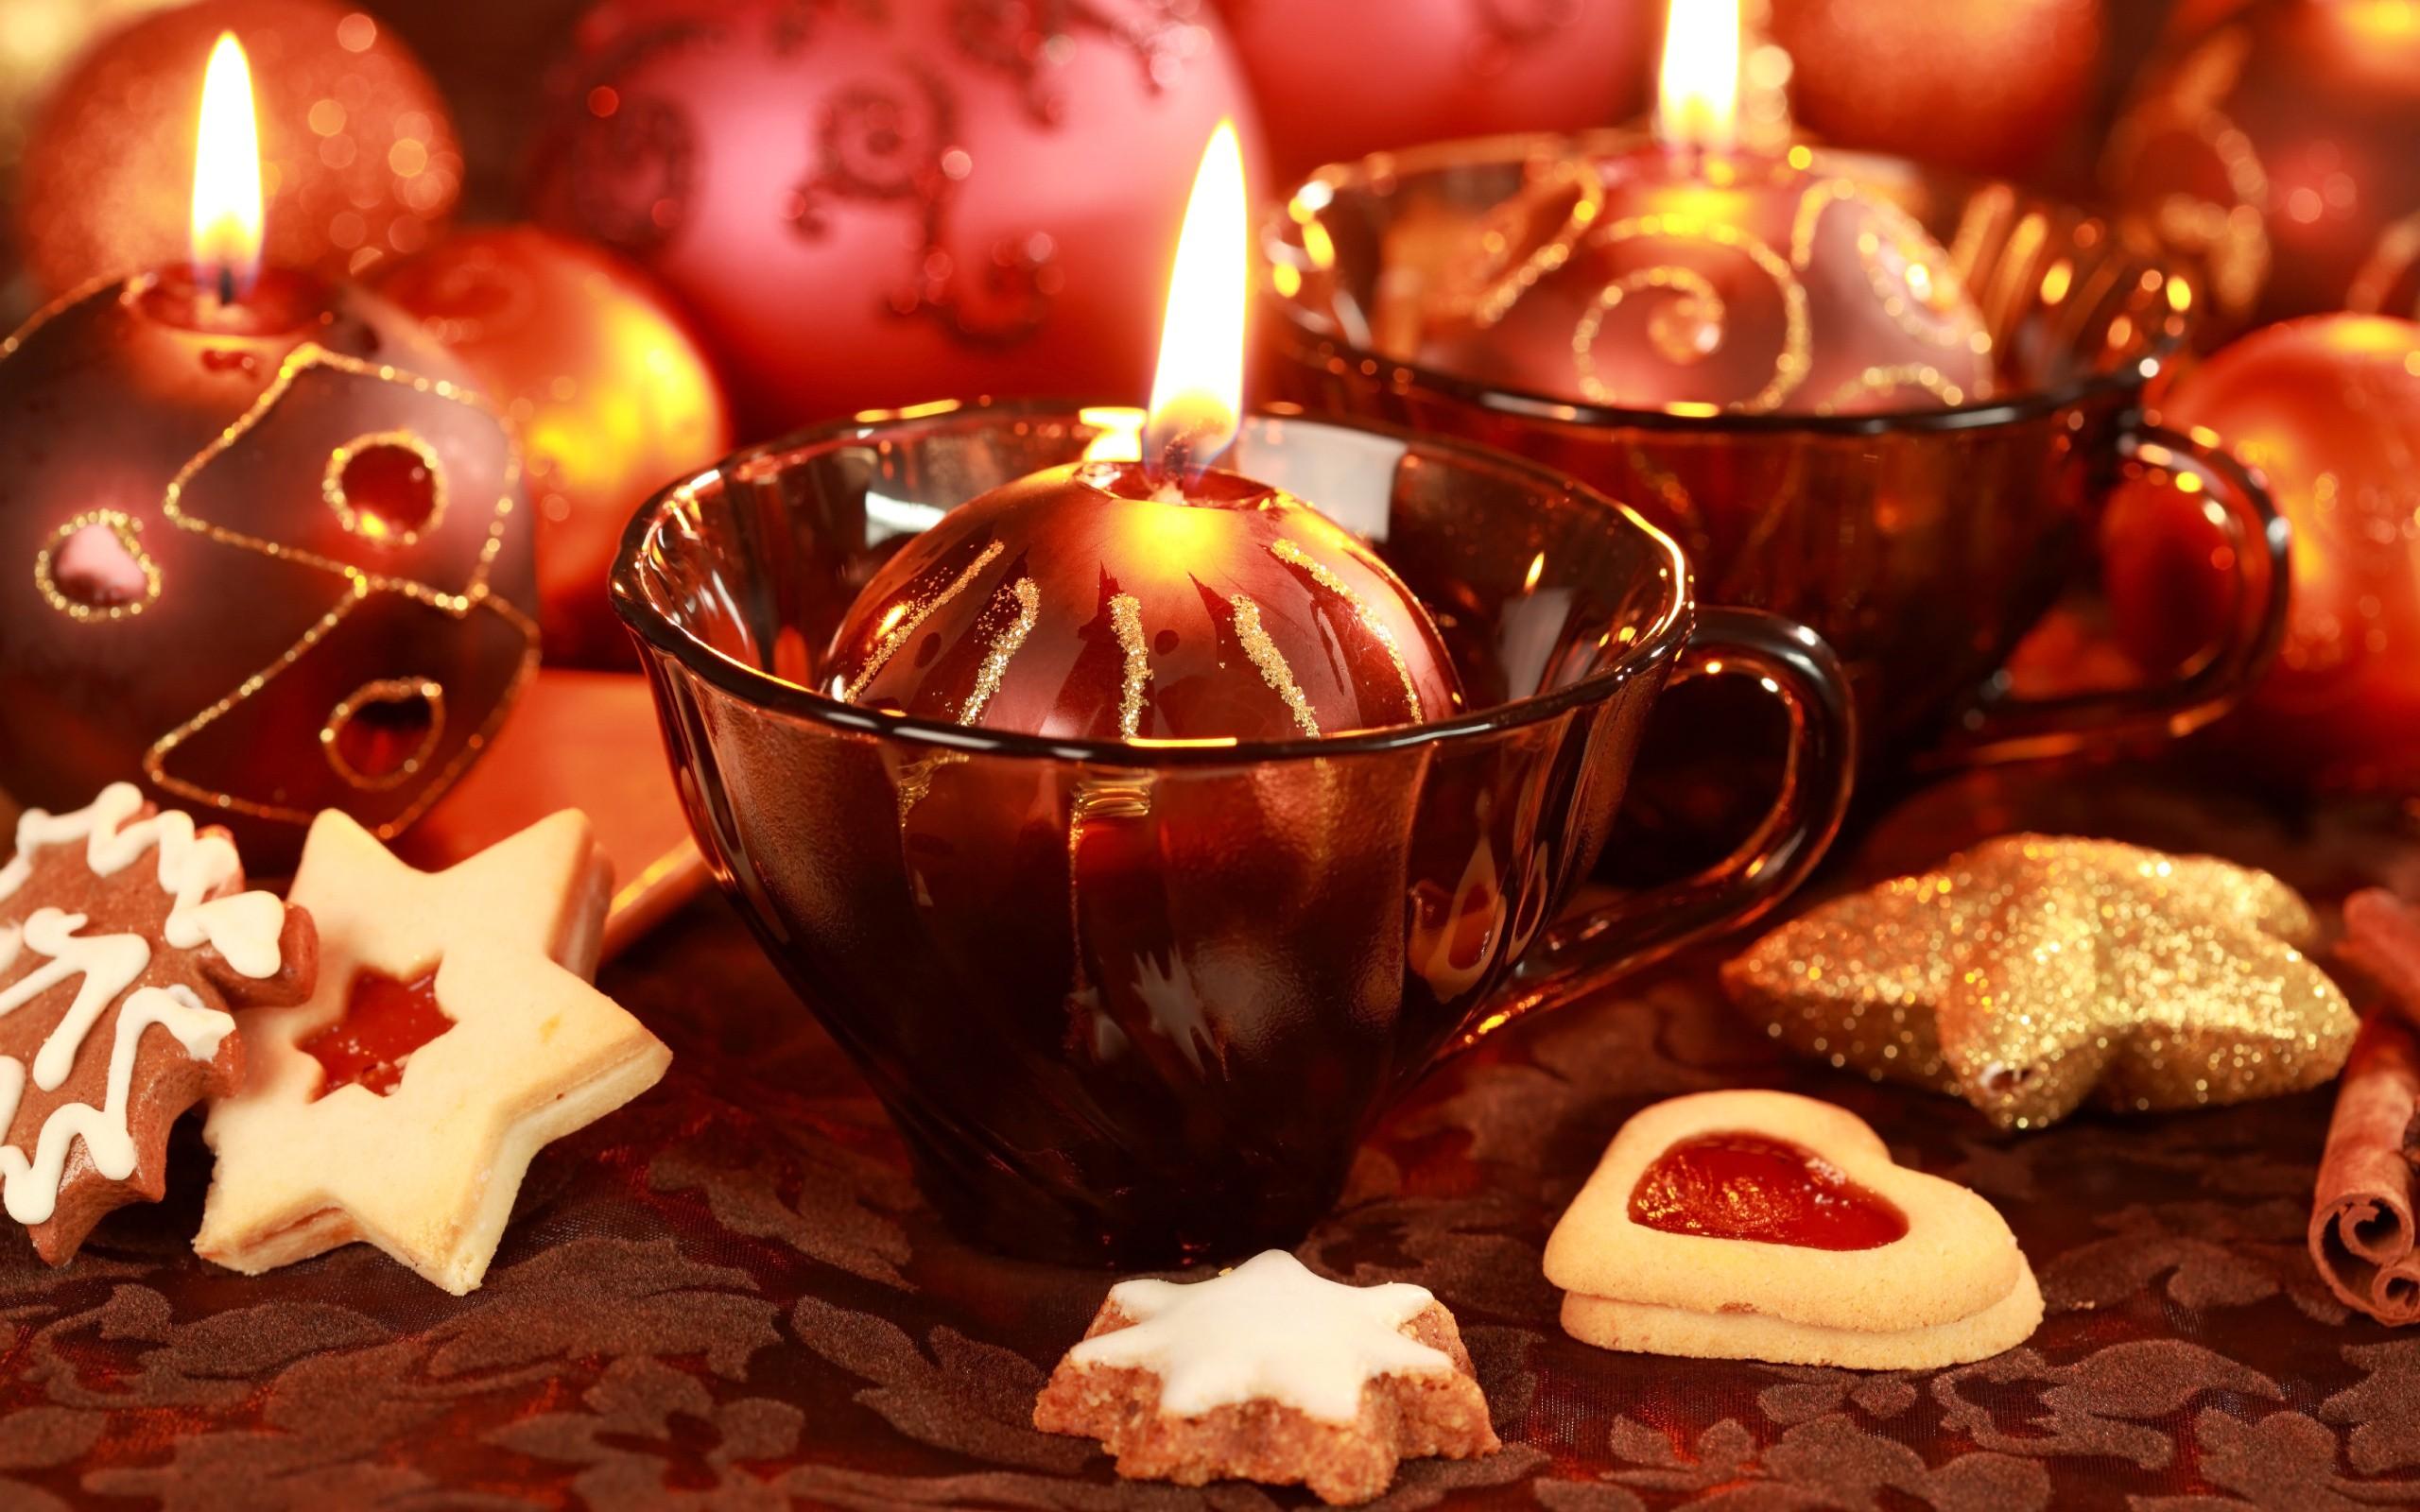 Sfondi cibo rosso candele addobbi natalizi tazza for Sfondi natalizi 1920x1080